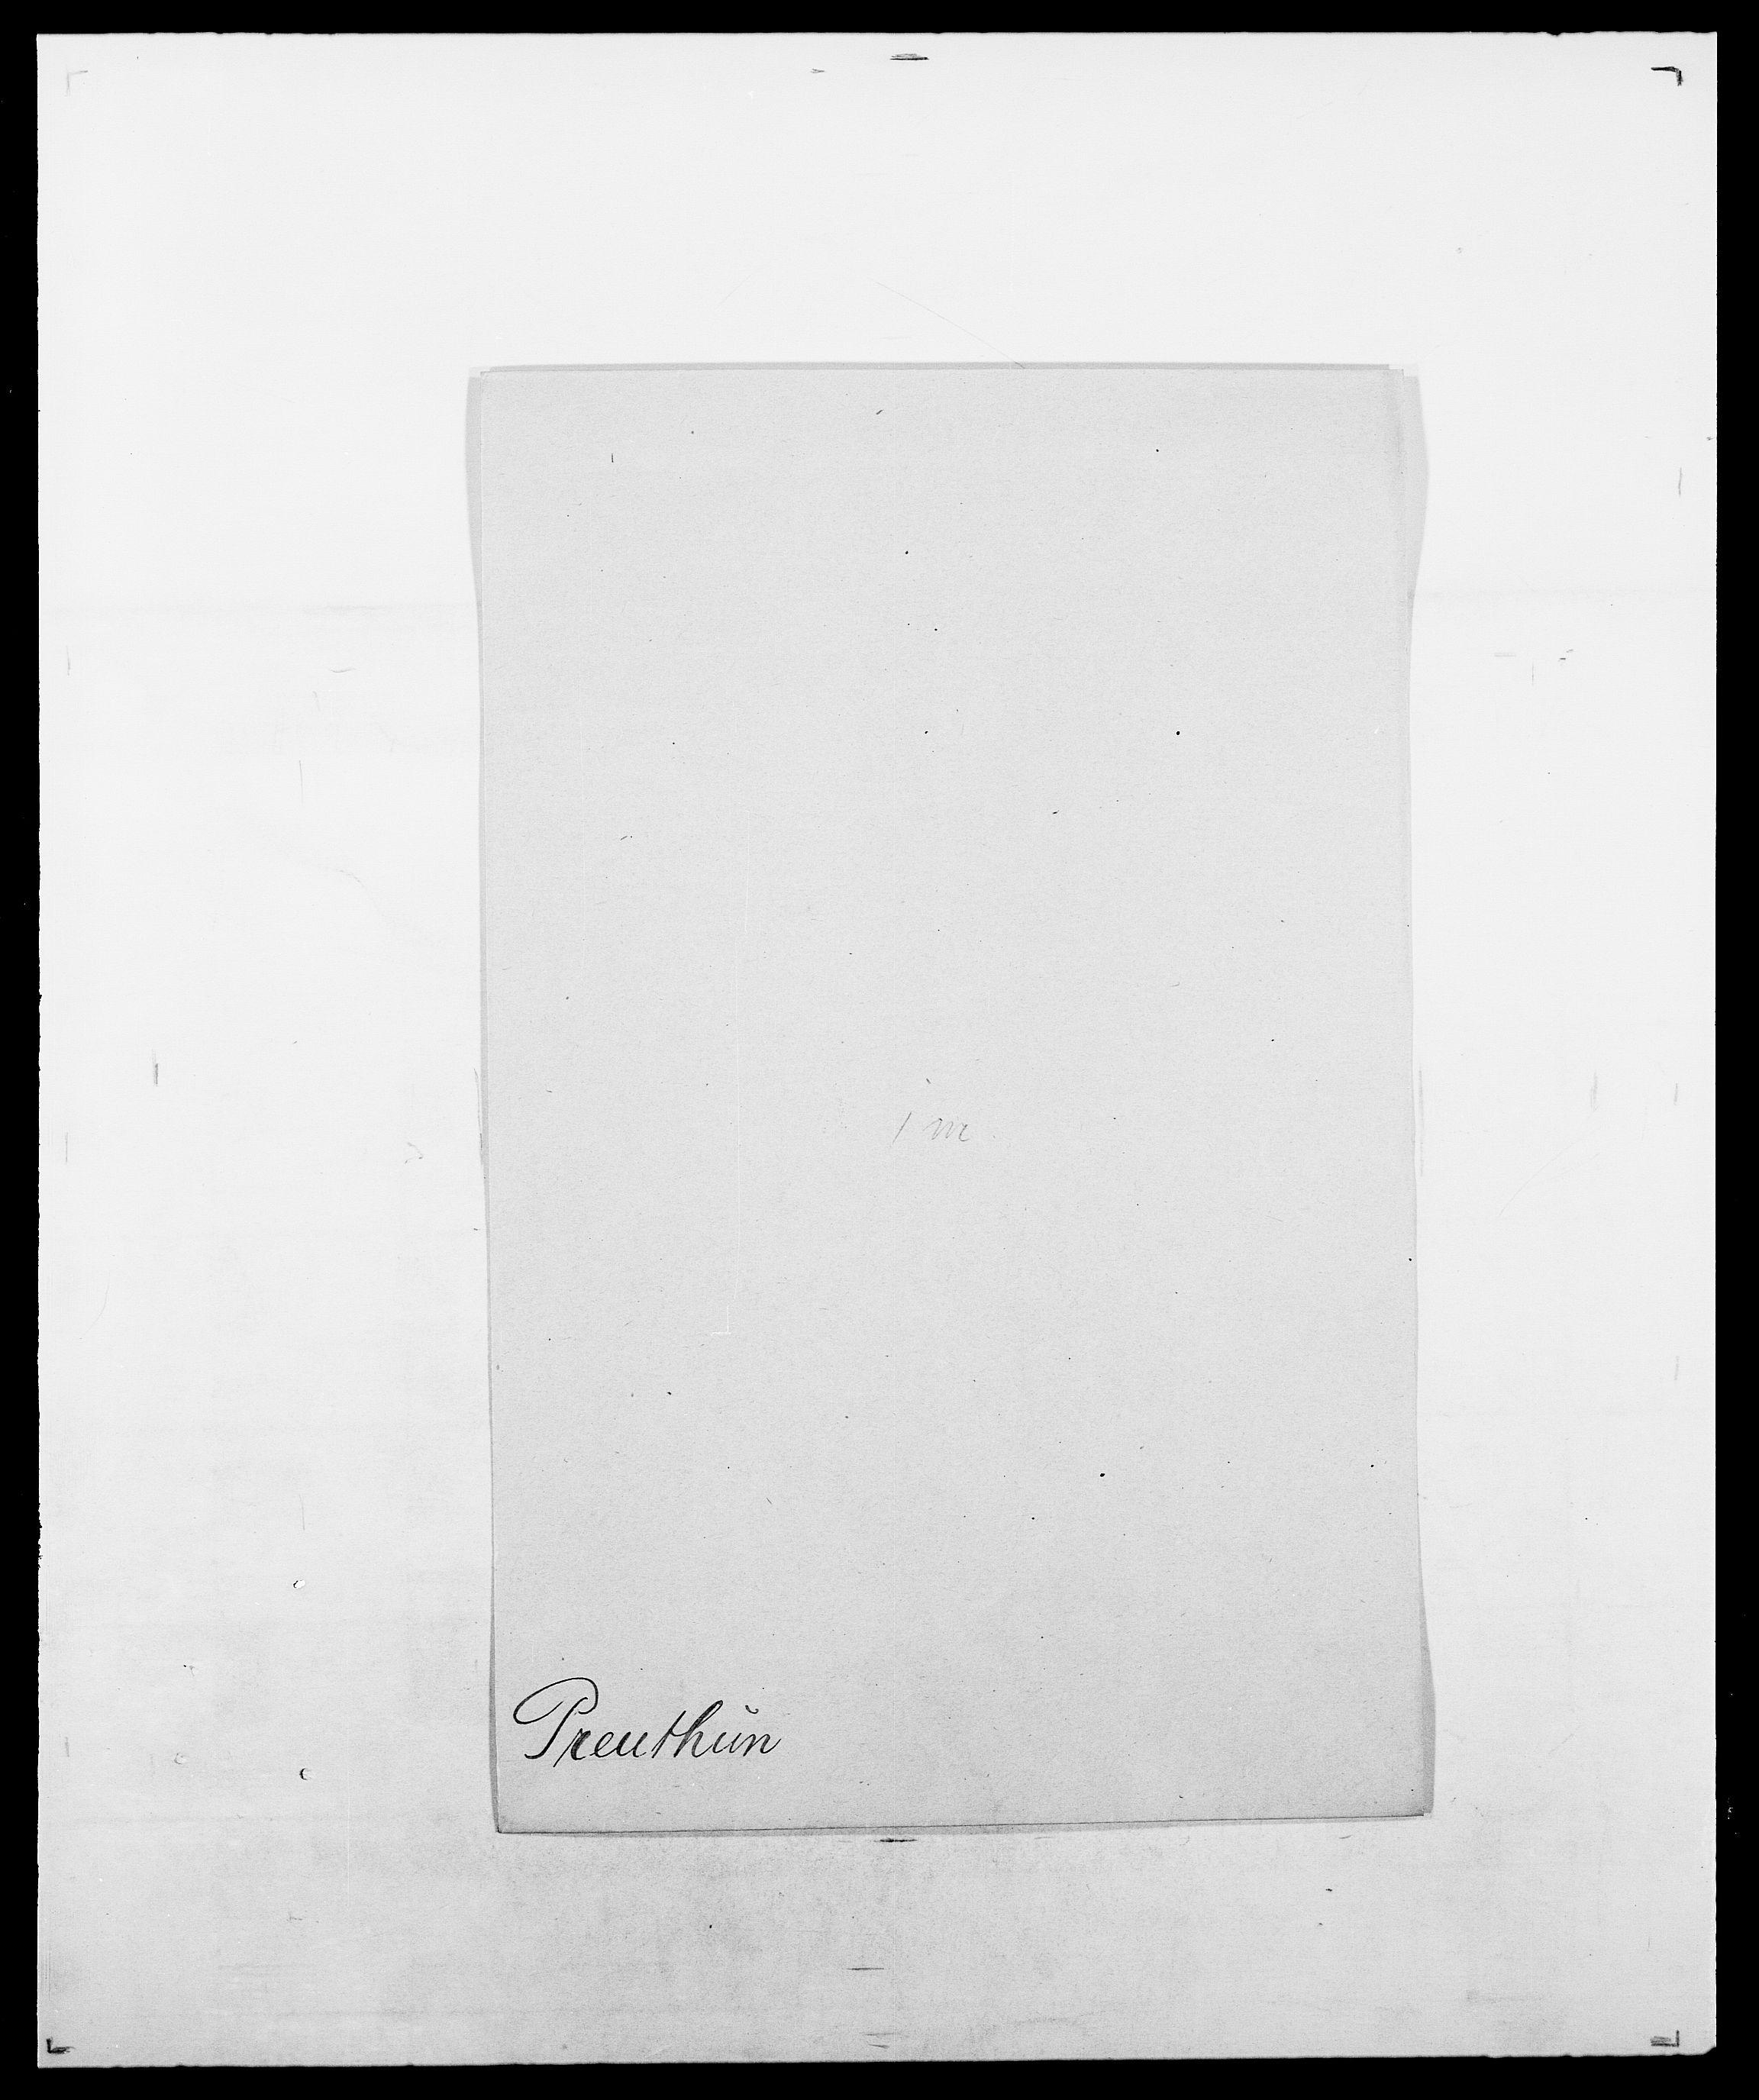 SAO, Delgobe, Charles Antoine - samling, D/Da/L0031: de Place - Raaum, s. 331